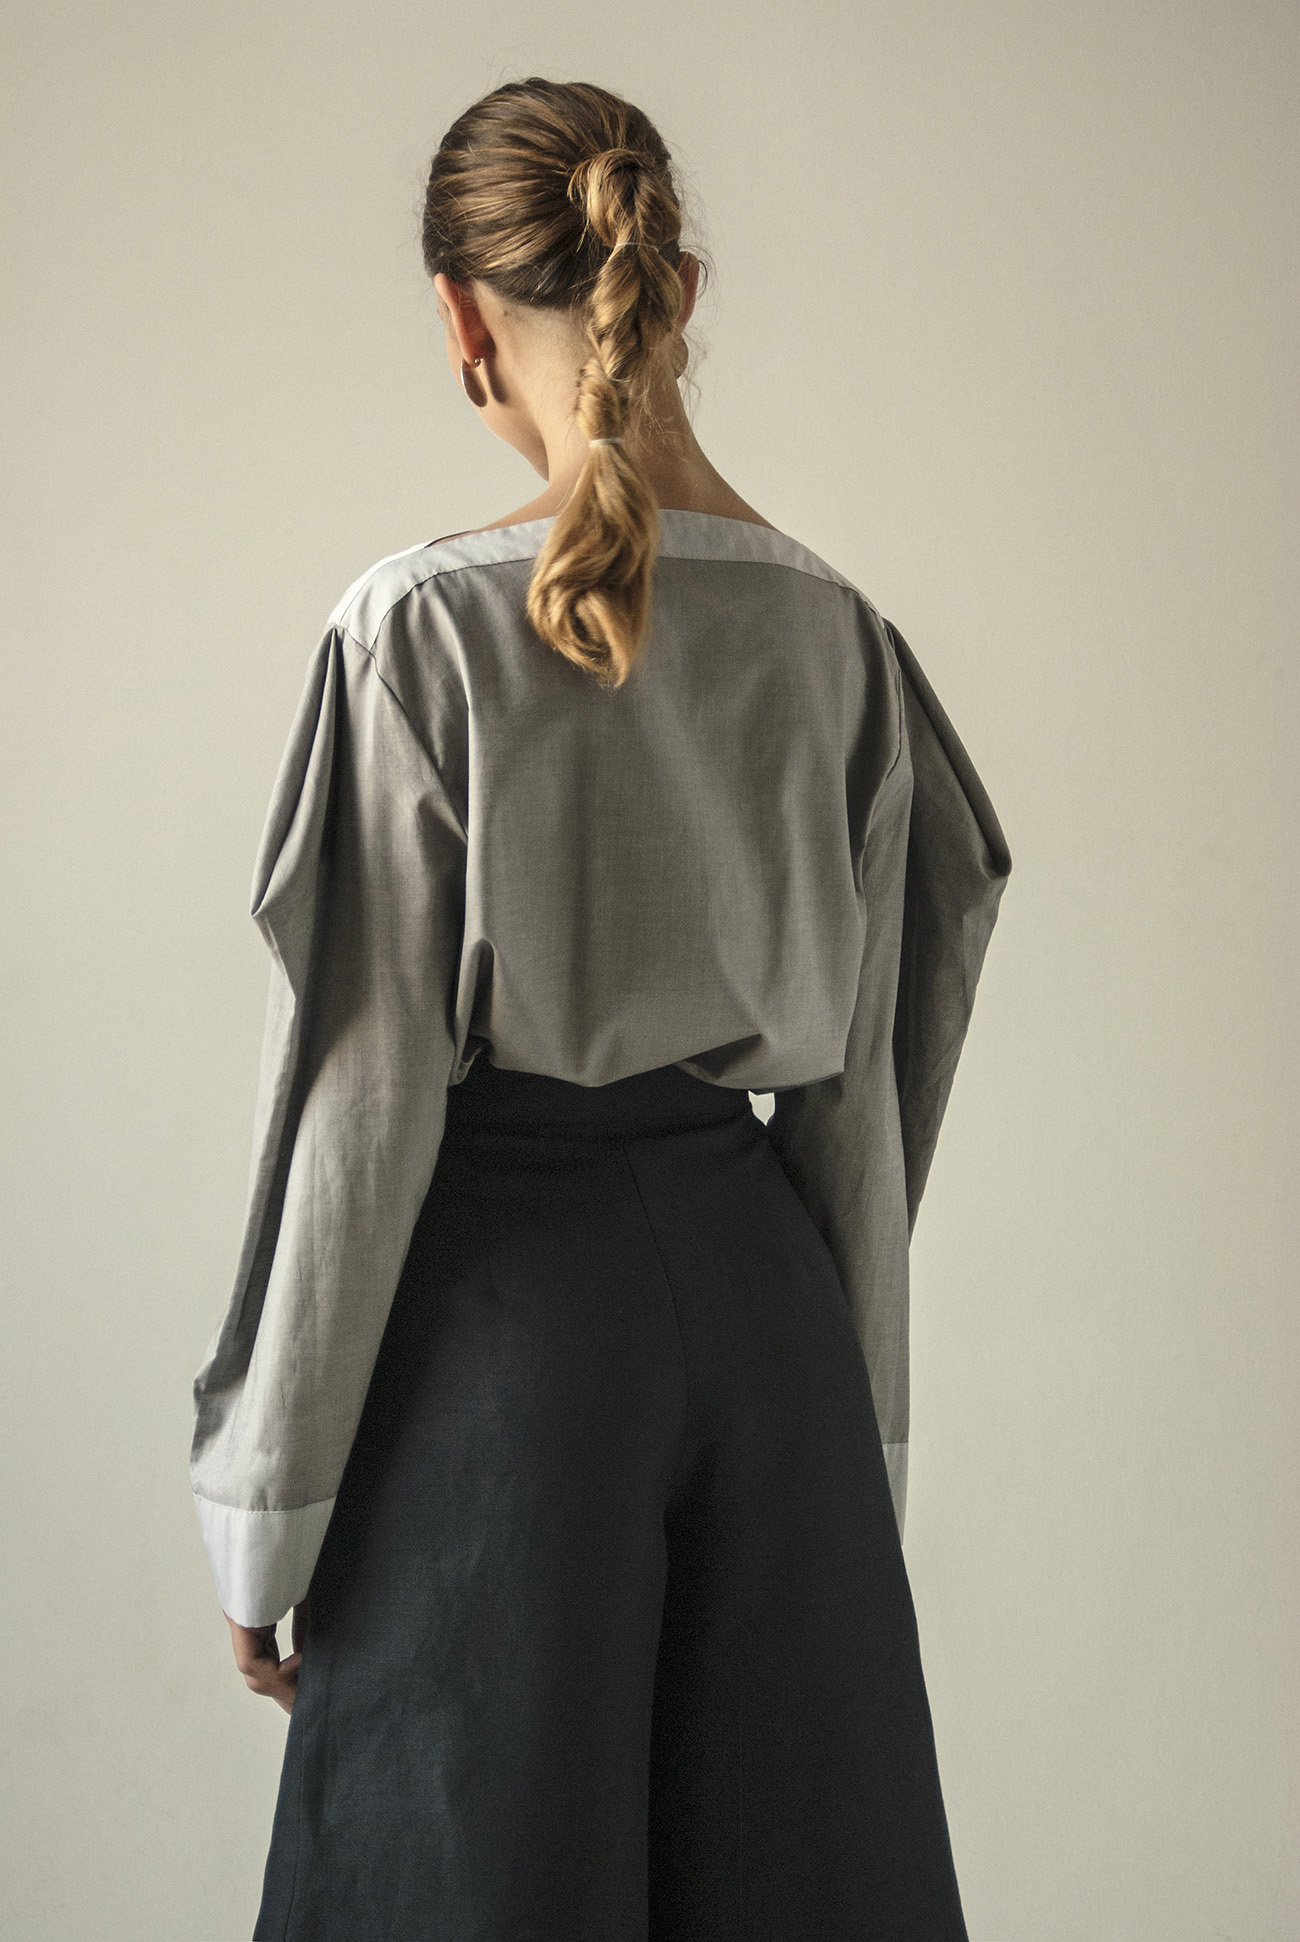 km-by-lange-gray-blouse-back.jpg